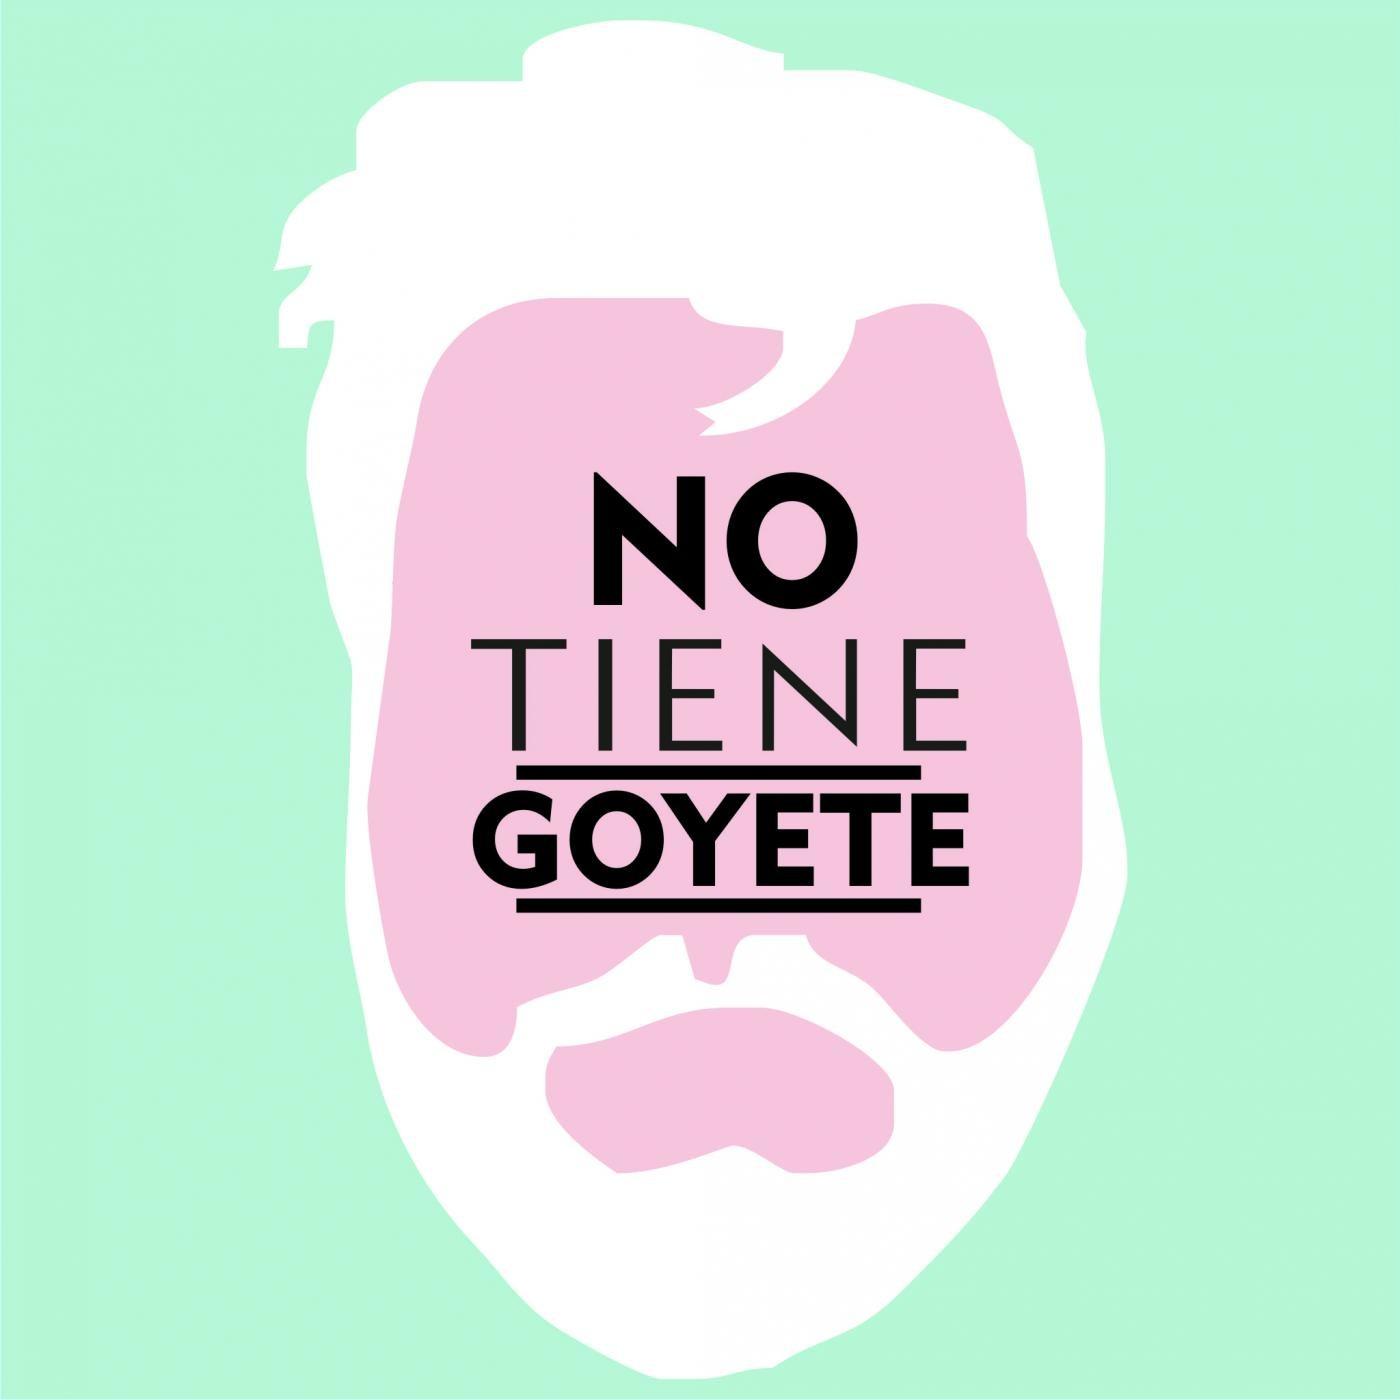 <![CDATA[No Tiene Goyete]]>